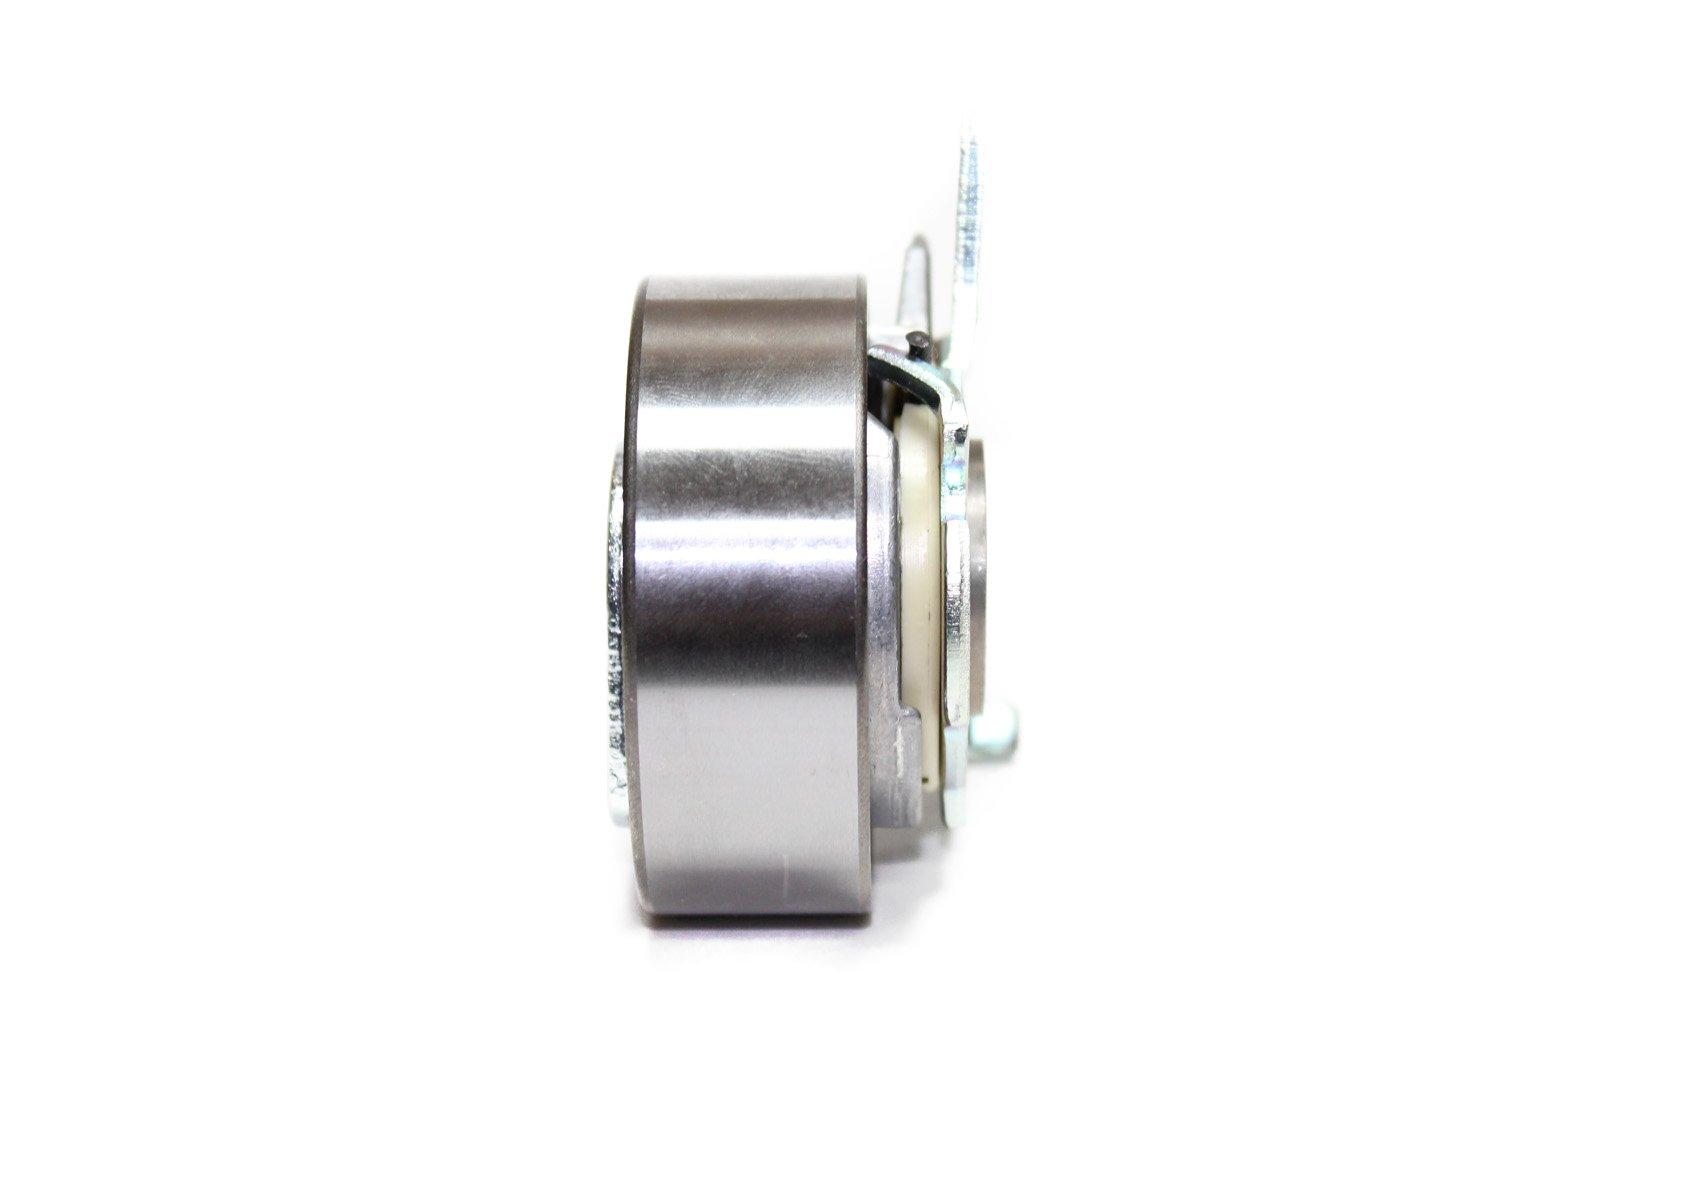 Timing Belt Tensioner for Chevy Chevrolet Optra Design Part 55567191